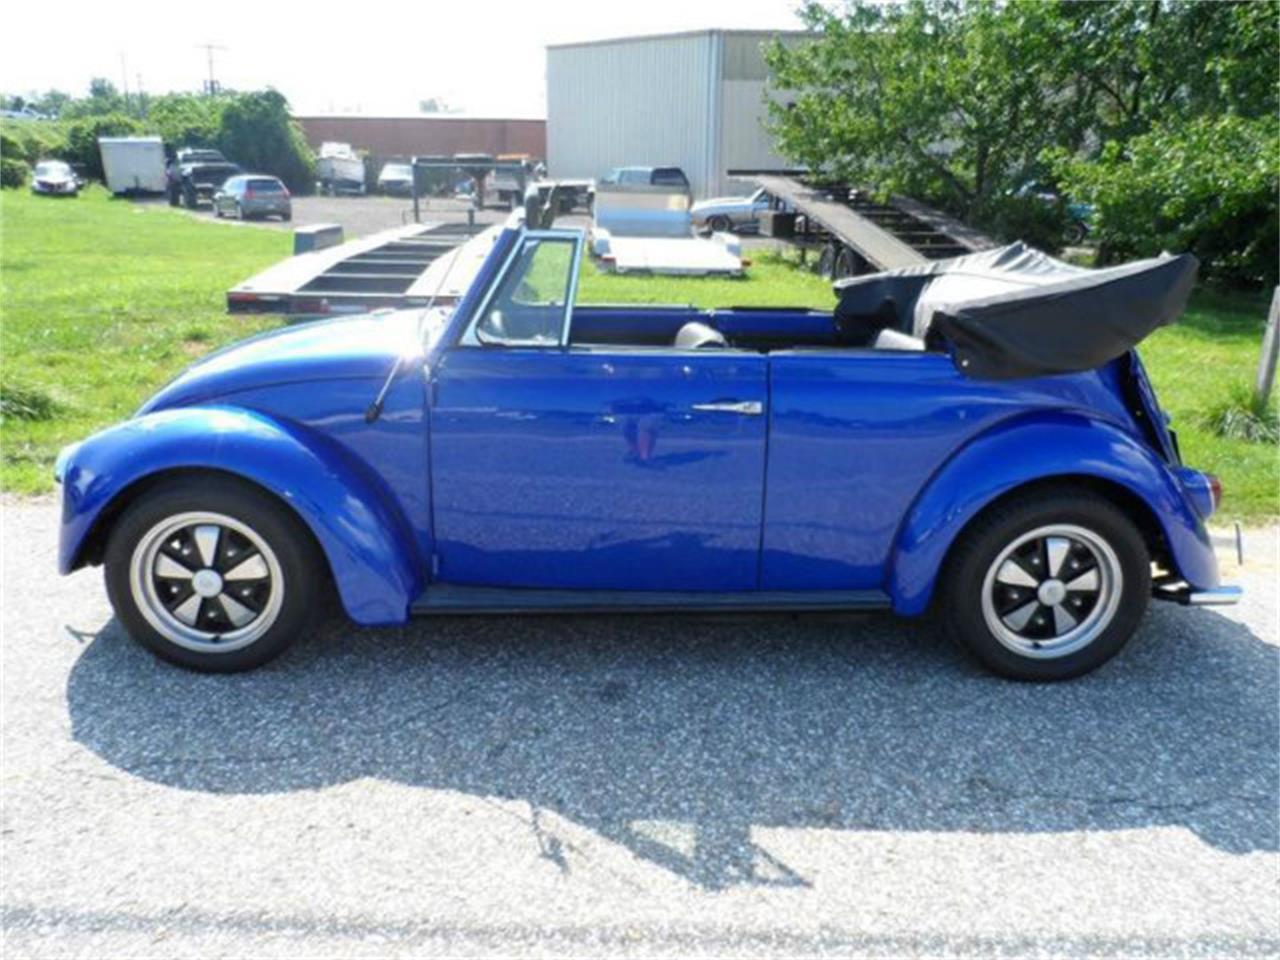 1967 Volkswagen Beetle For Sale Classiccars Com Cc 909084